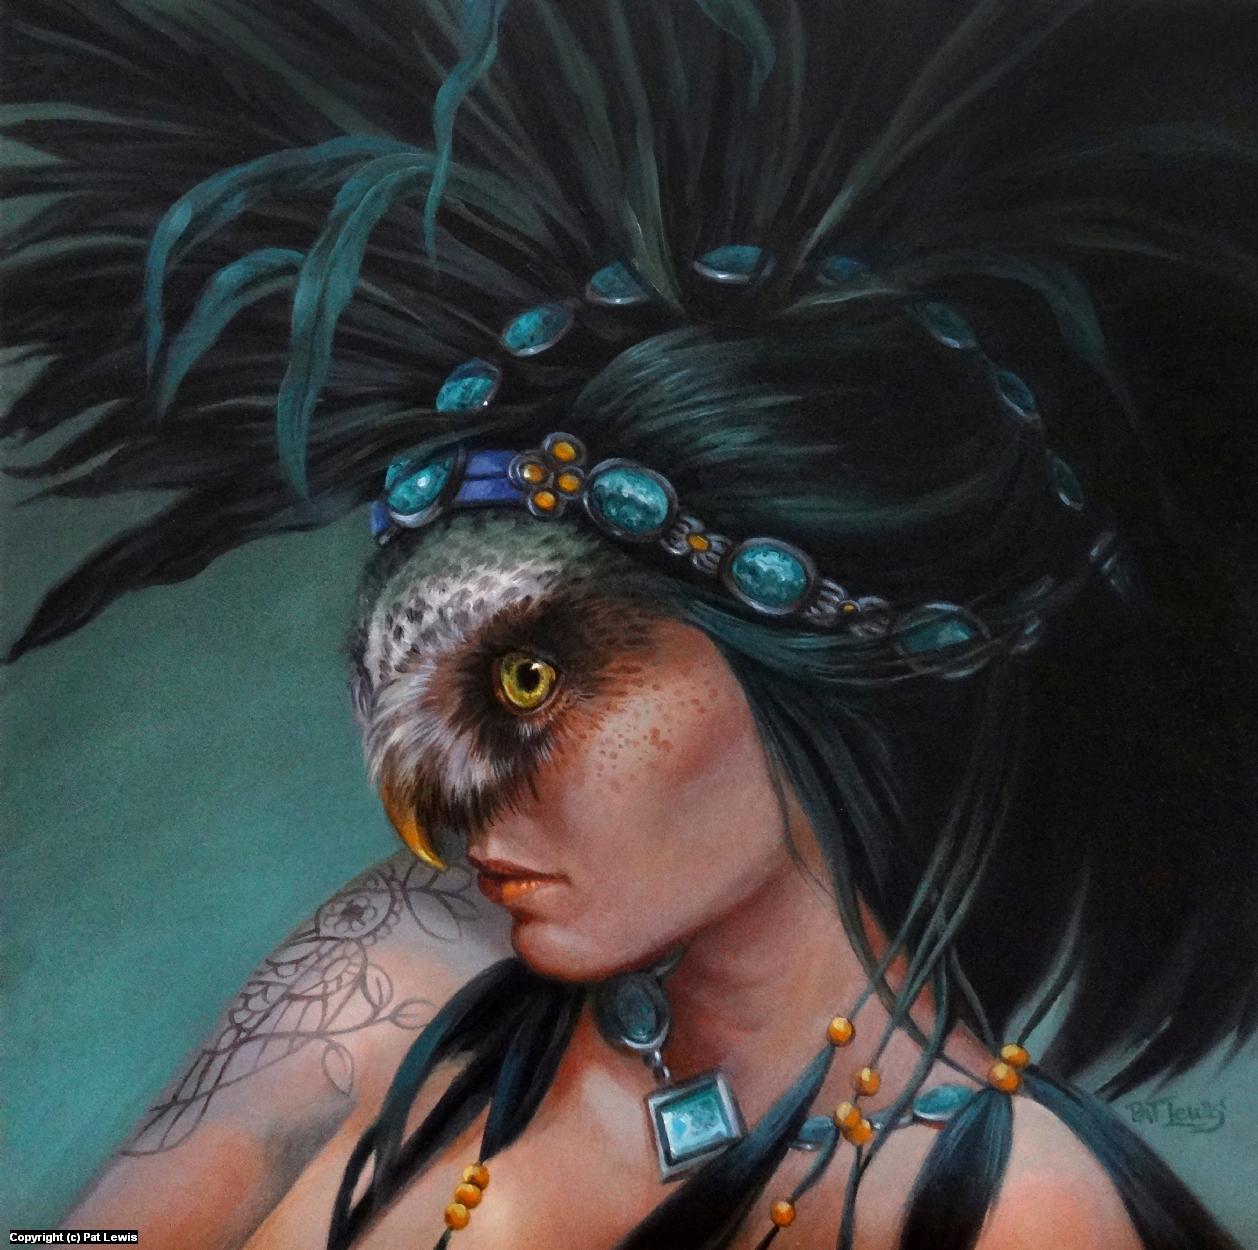 Owl Spirit Artwork by Pat morrissey-Lewis